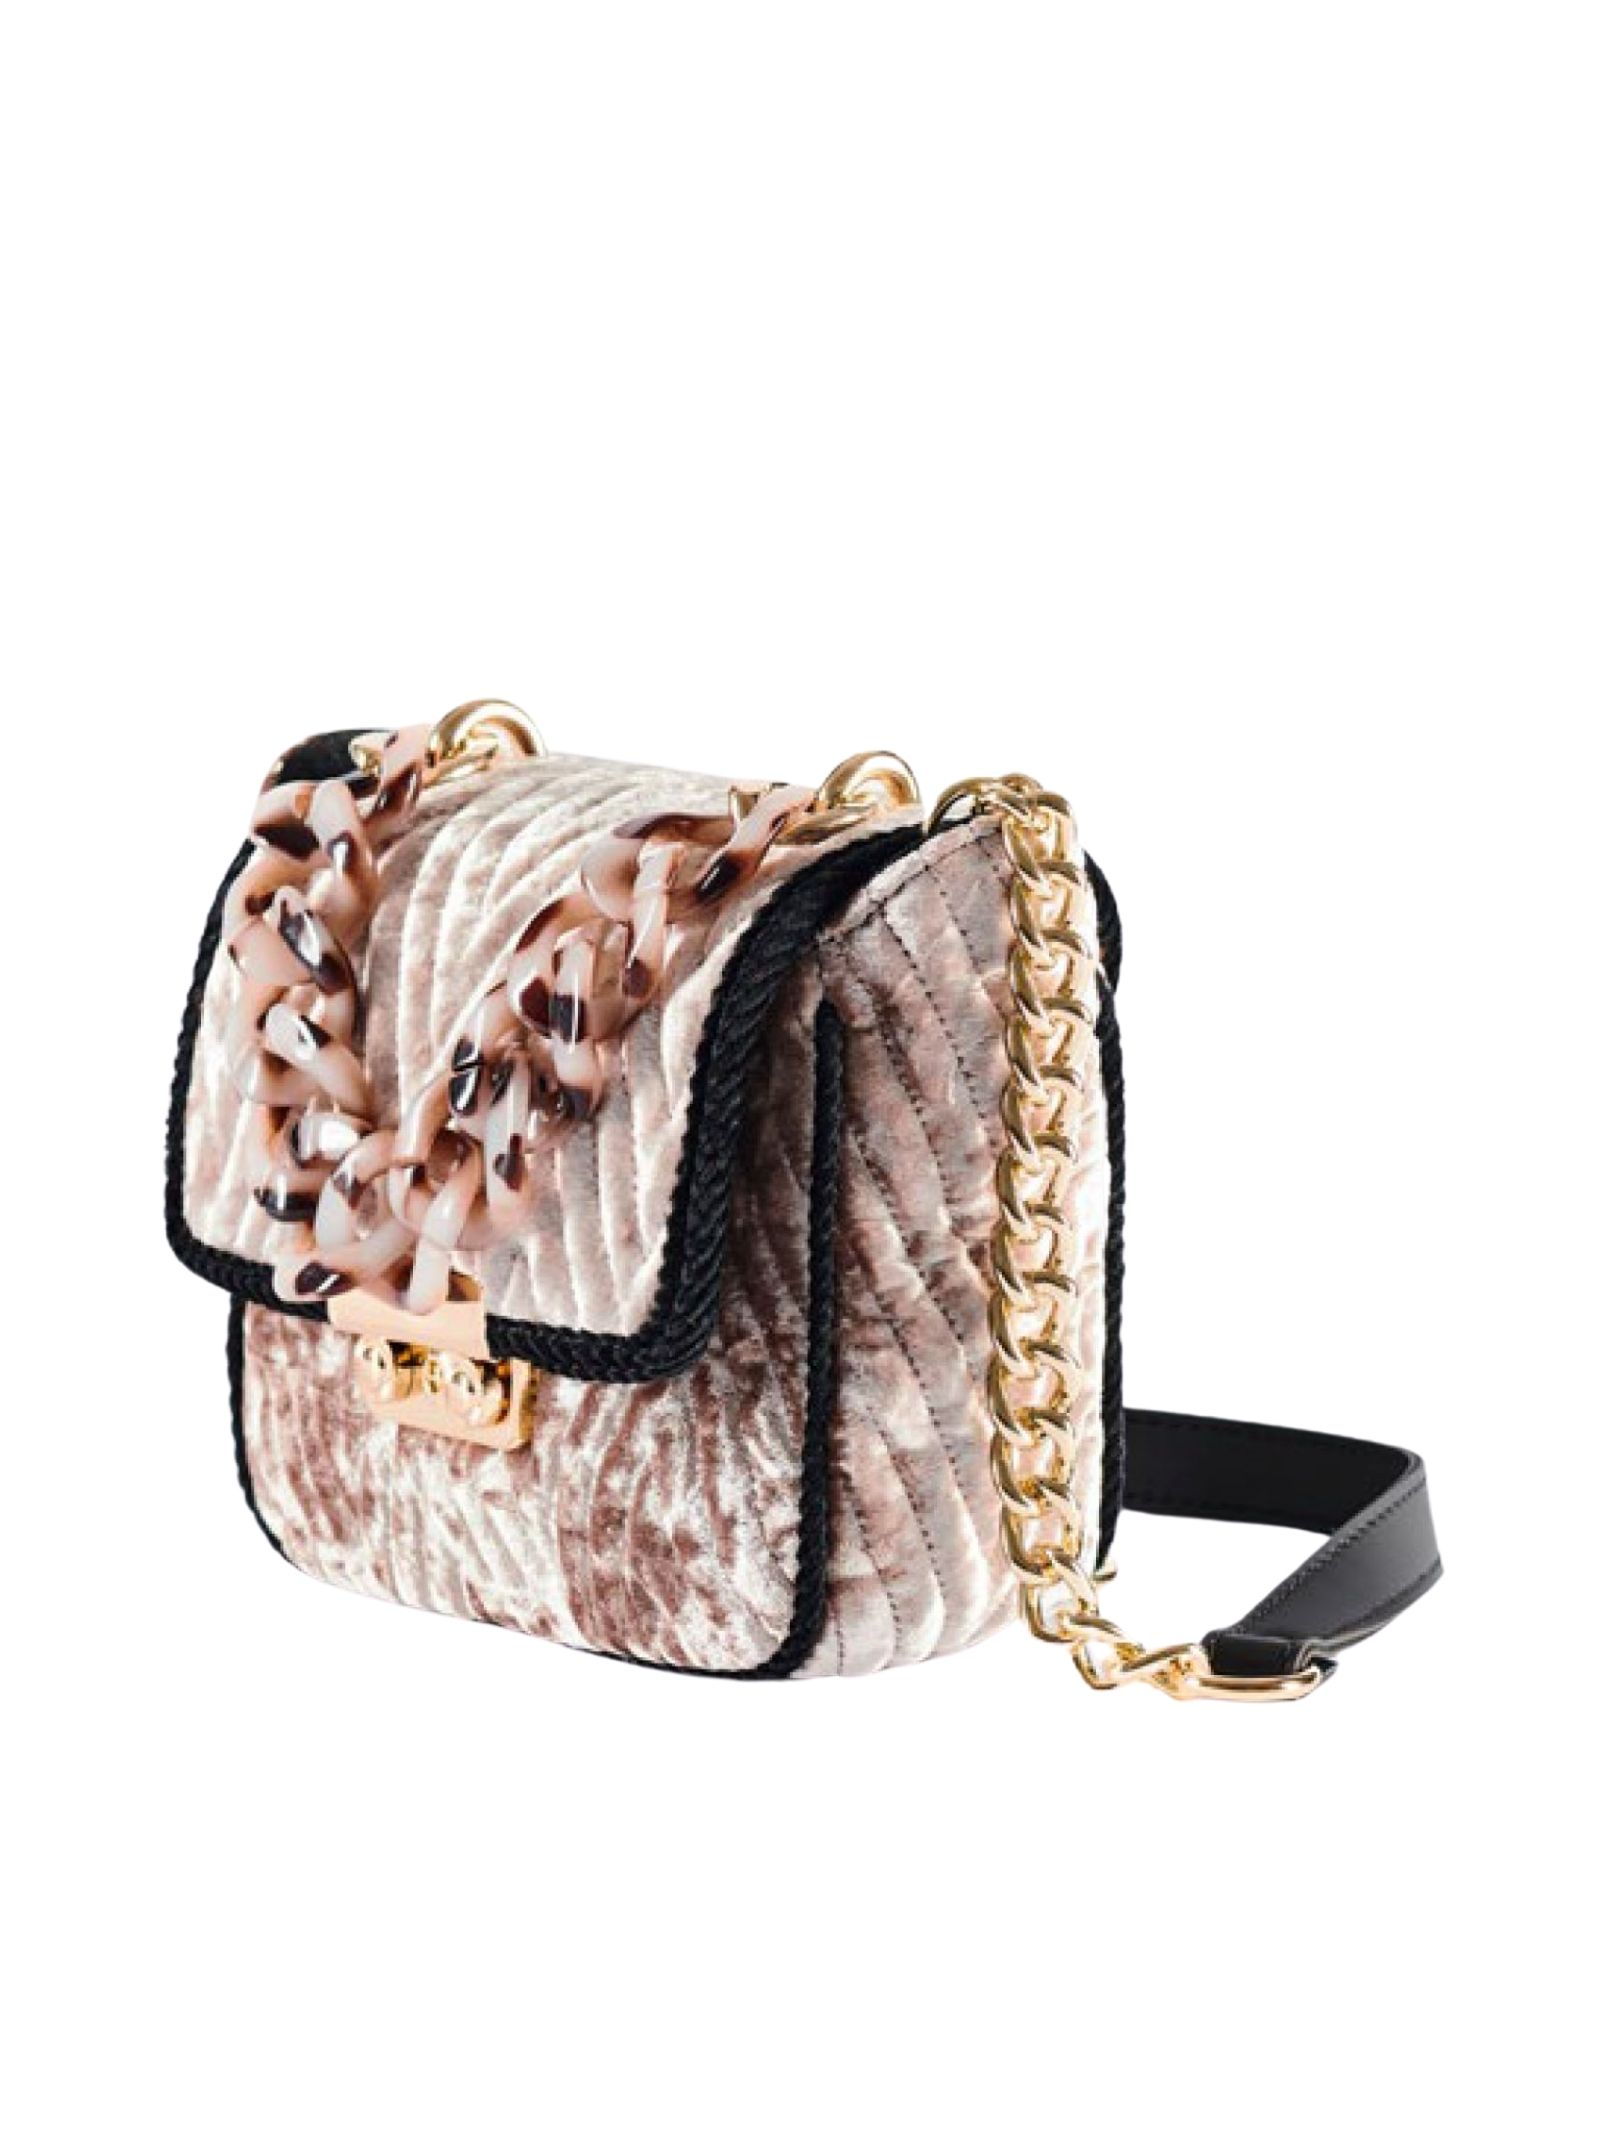 Via Mail Bag | Bags and backpacks | MINIV03